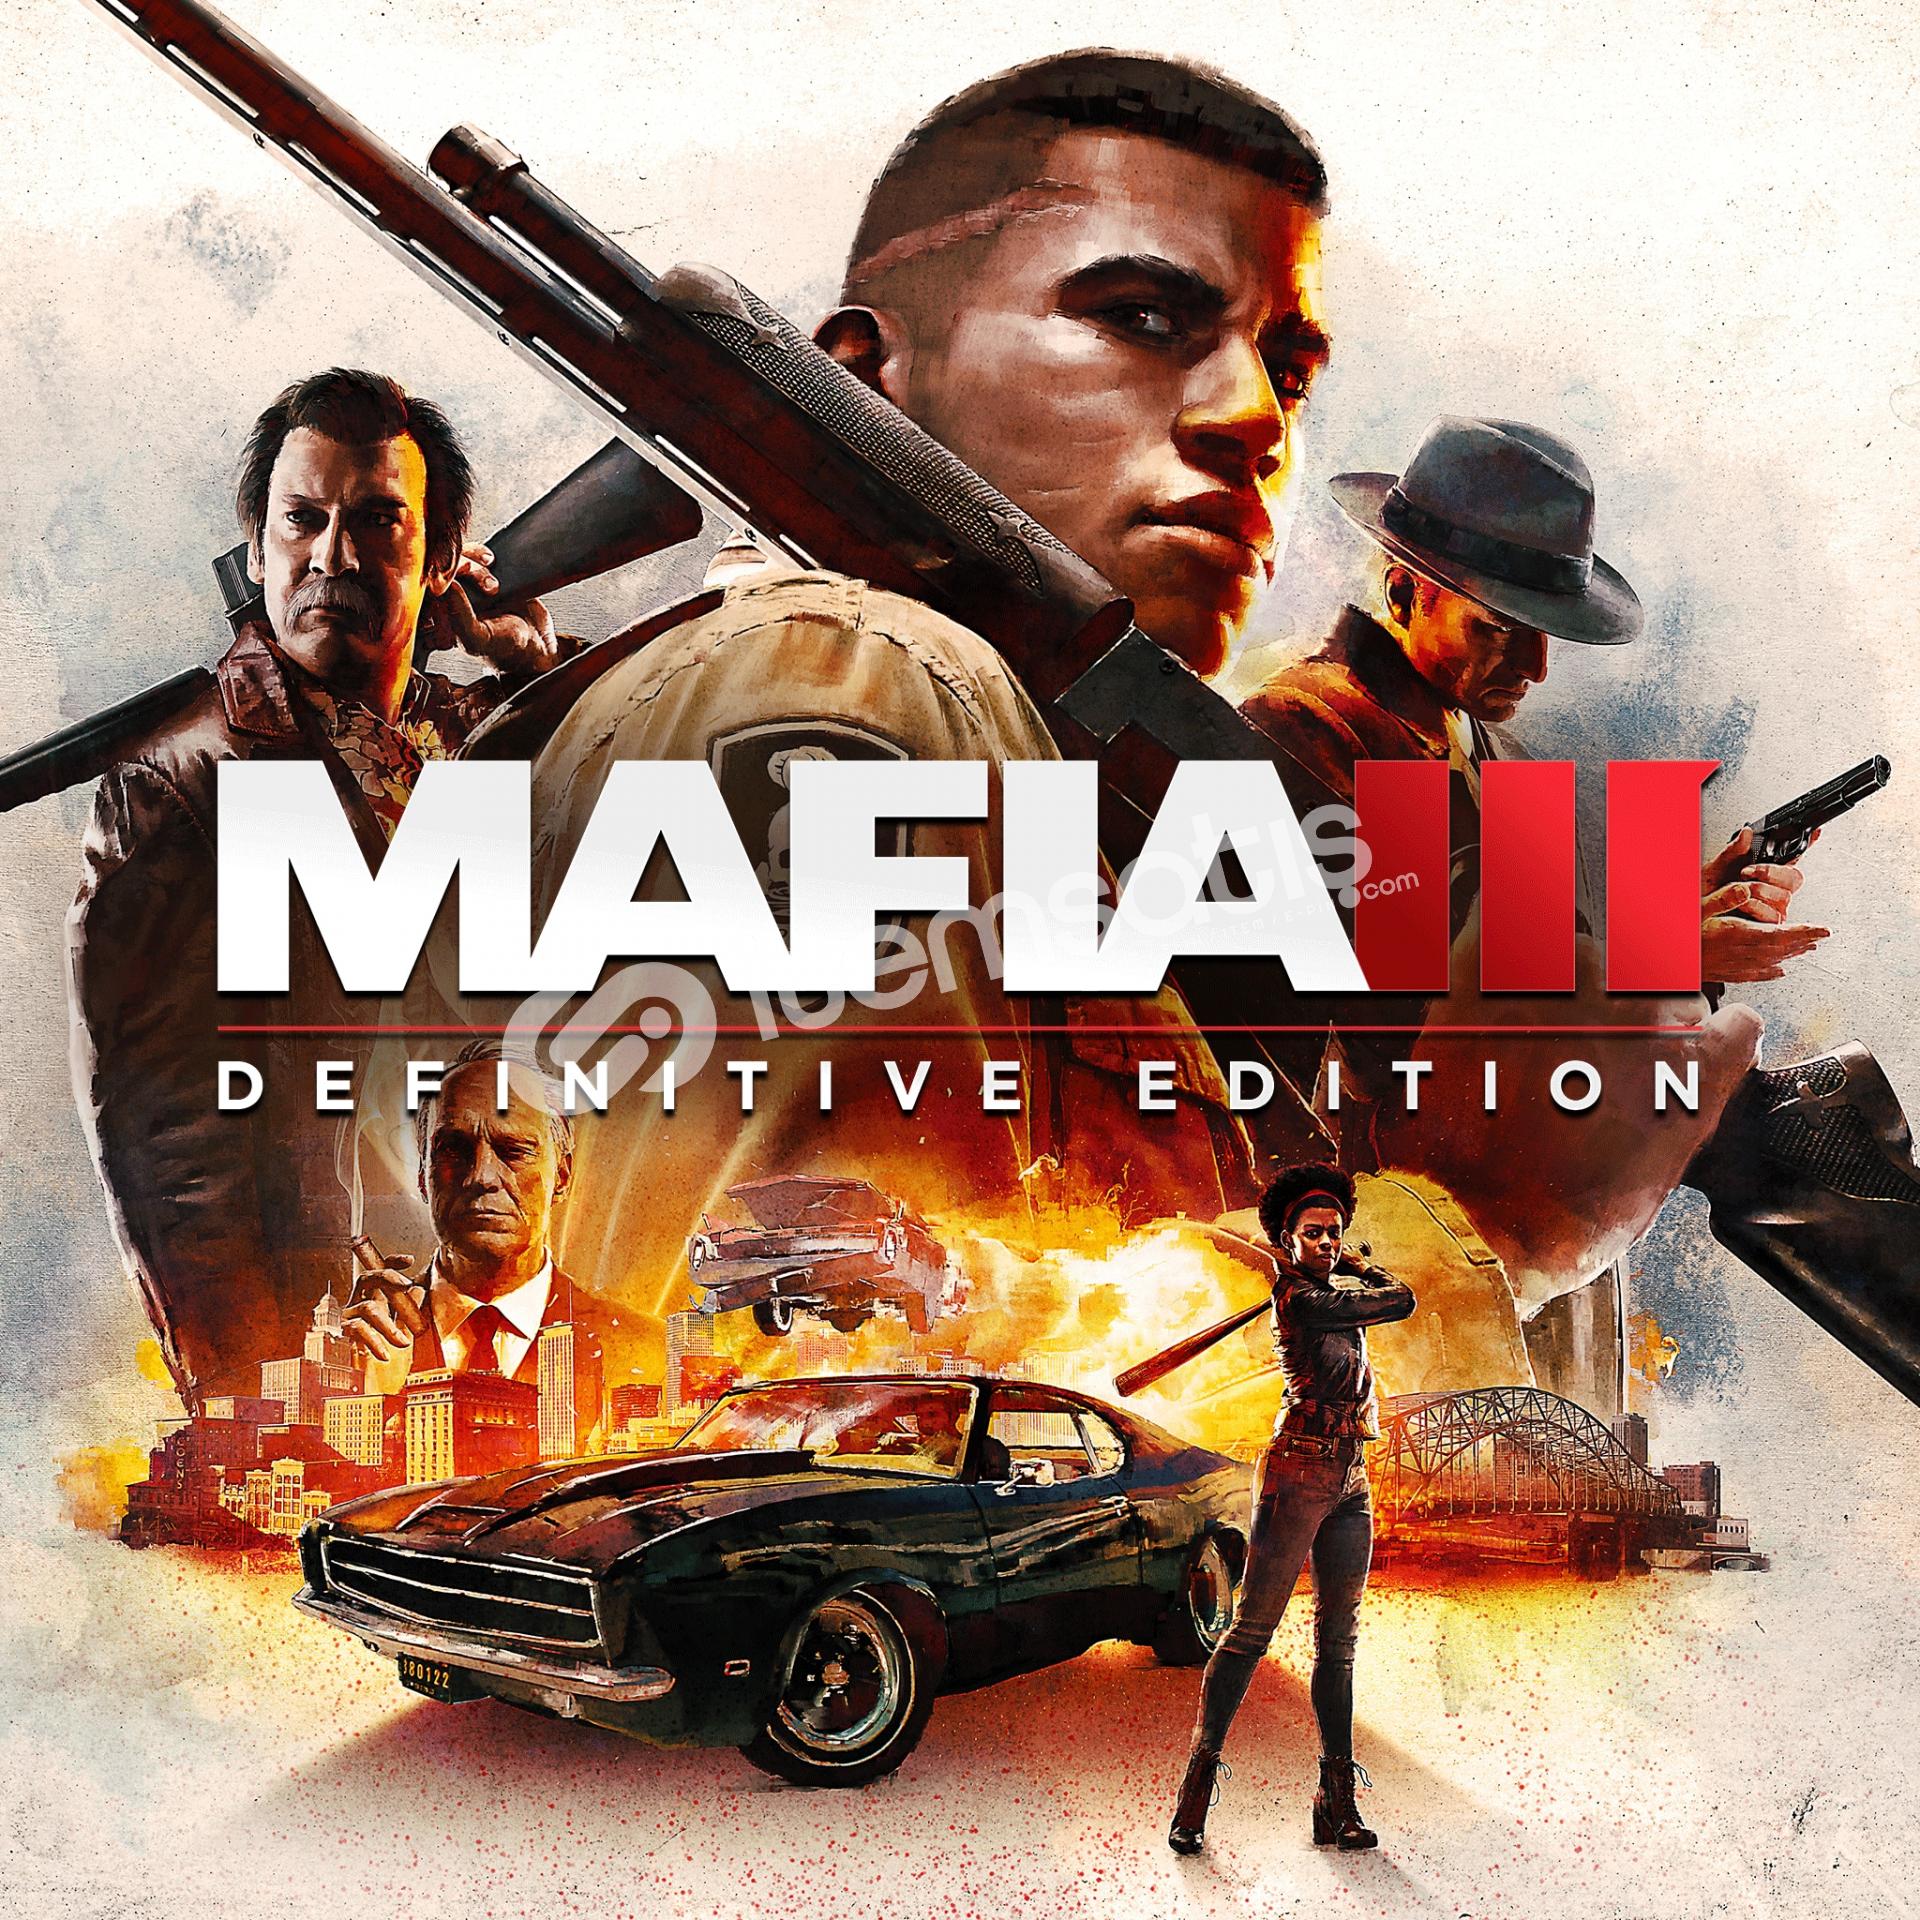 Mafia 3 Bulunan Steam hesabı